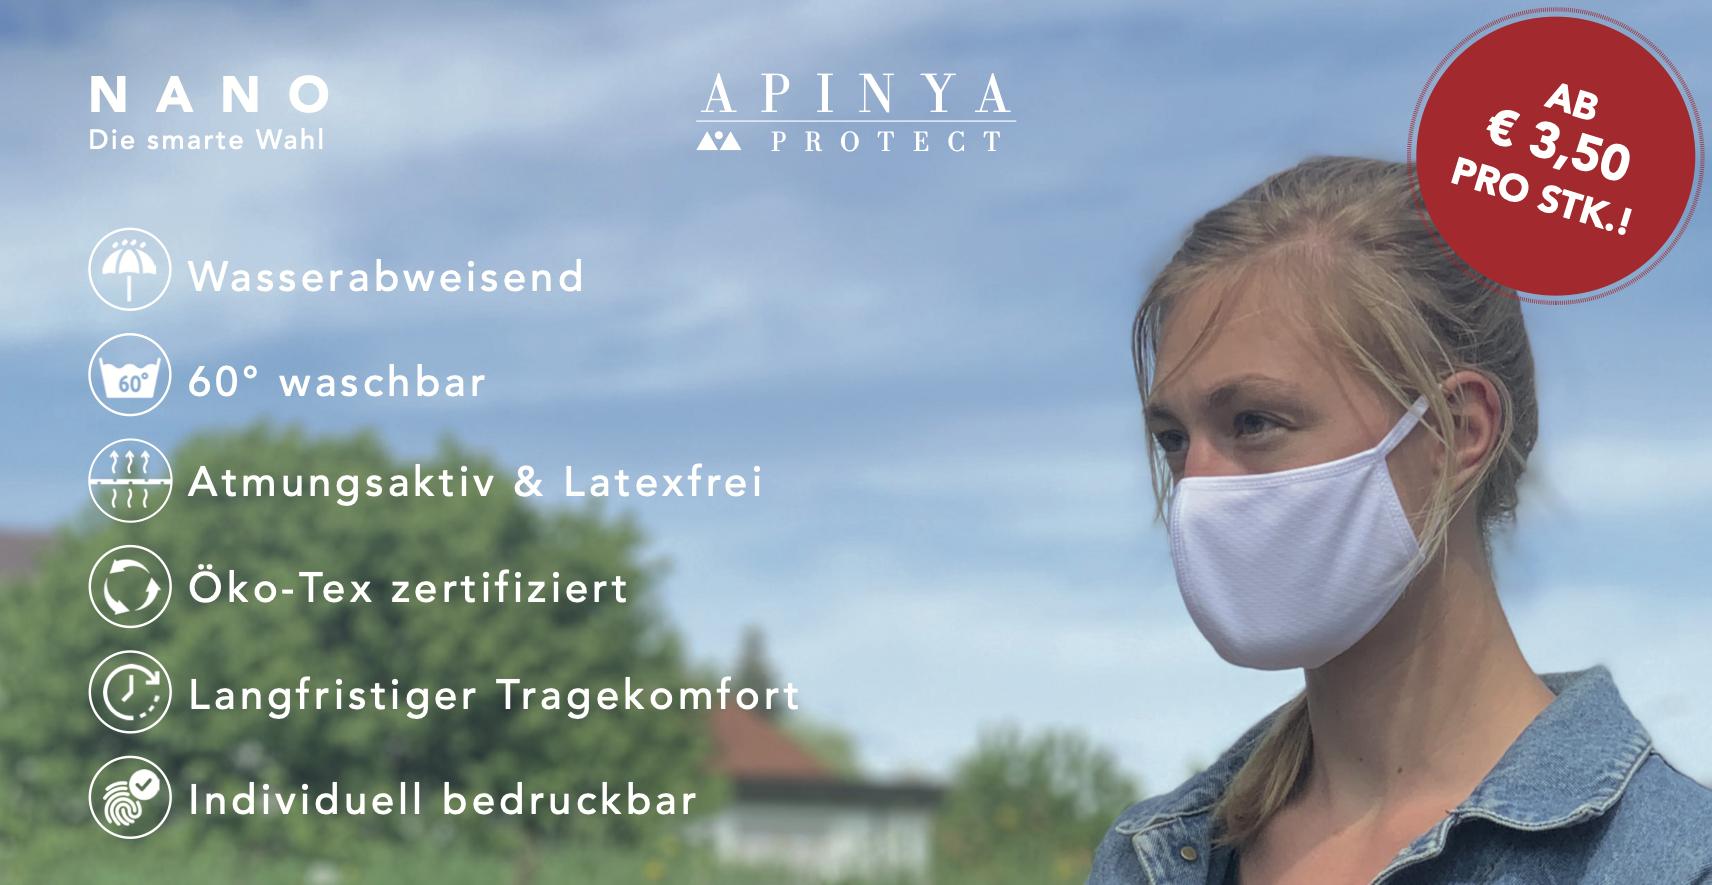 Werbebild Blonde Frau mit Maske